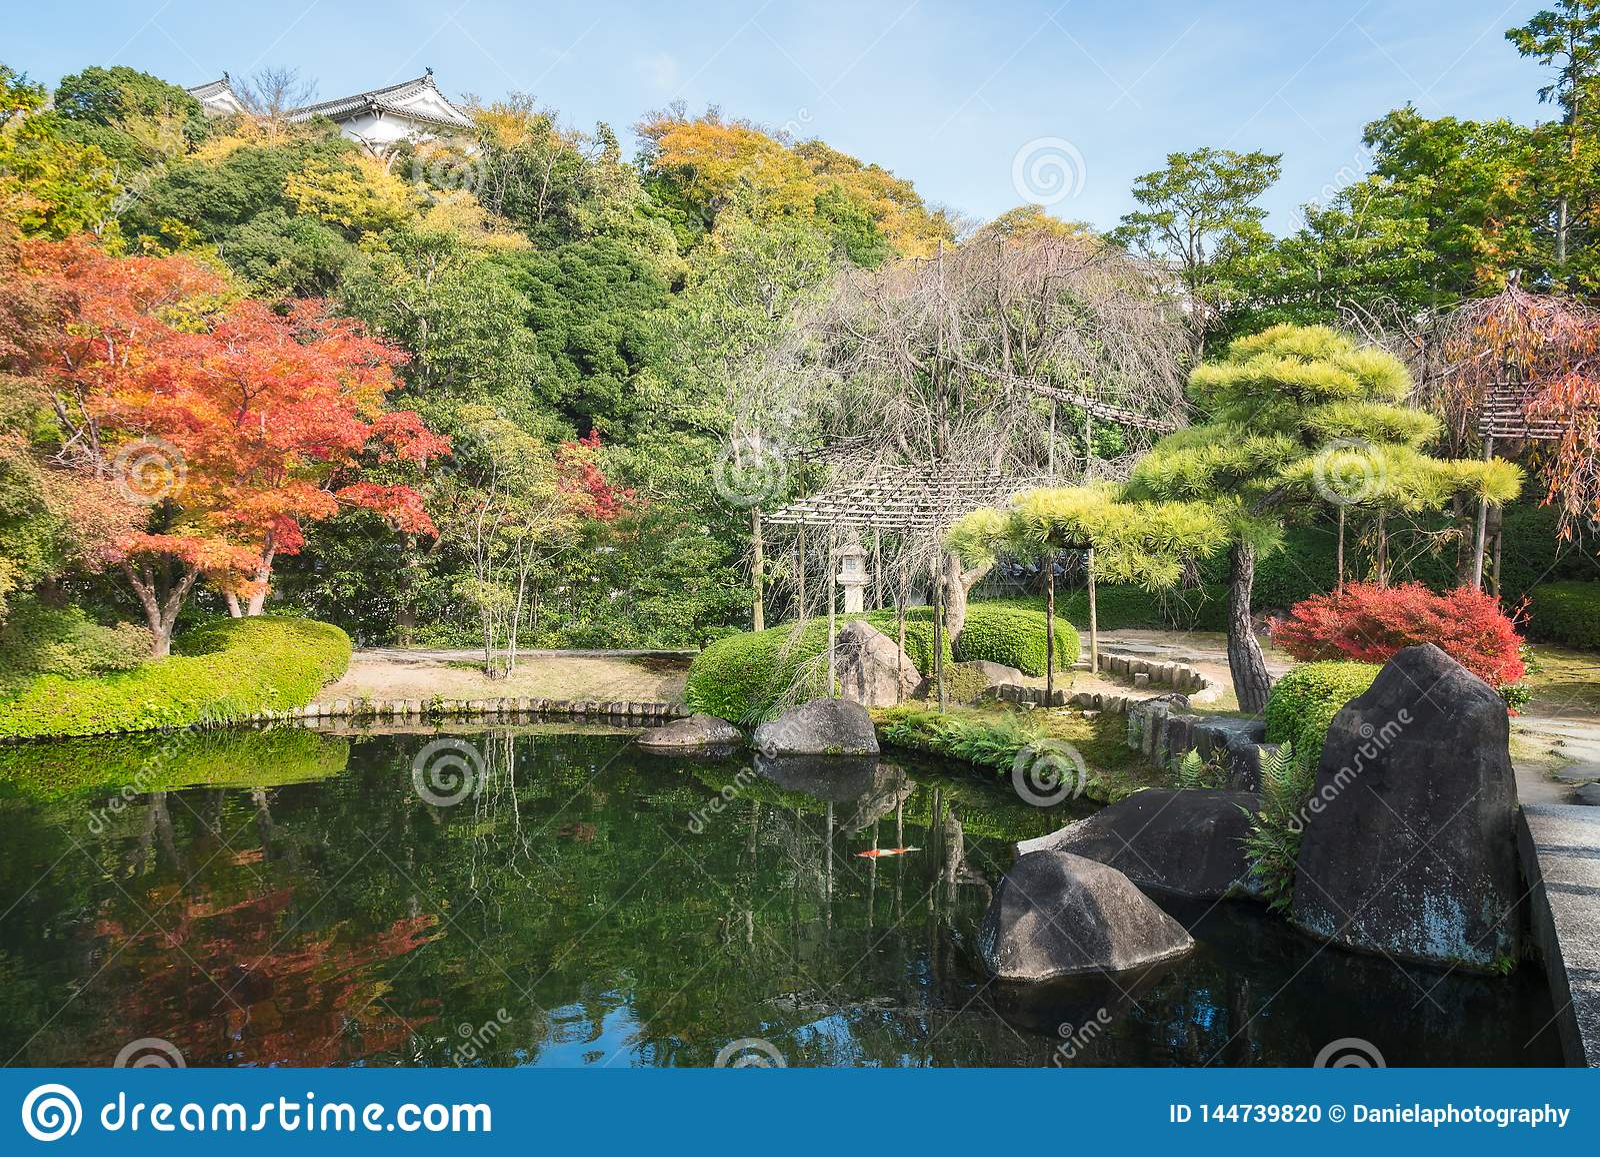 Charming corner of Koko-en Garden in autumn, in Himeji, Japan